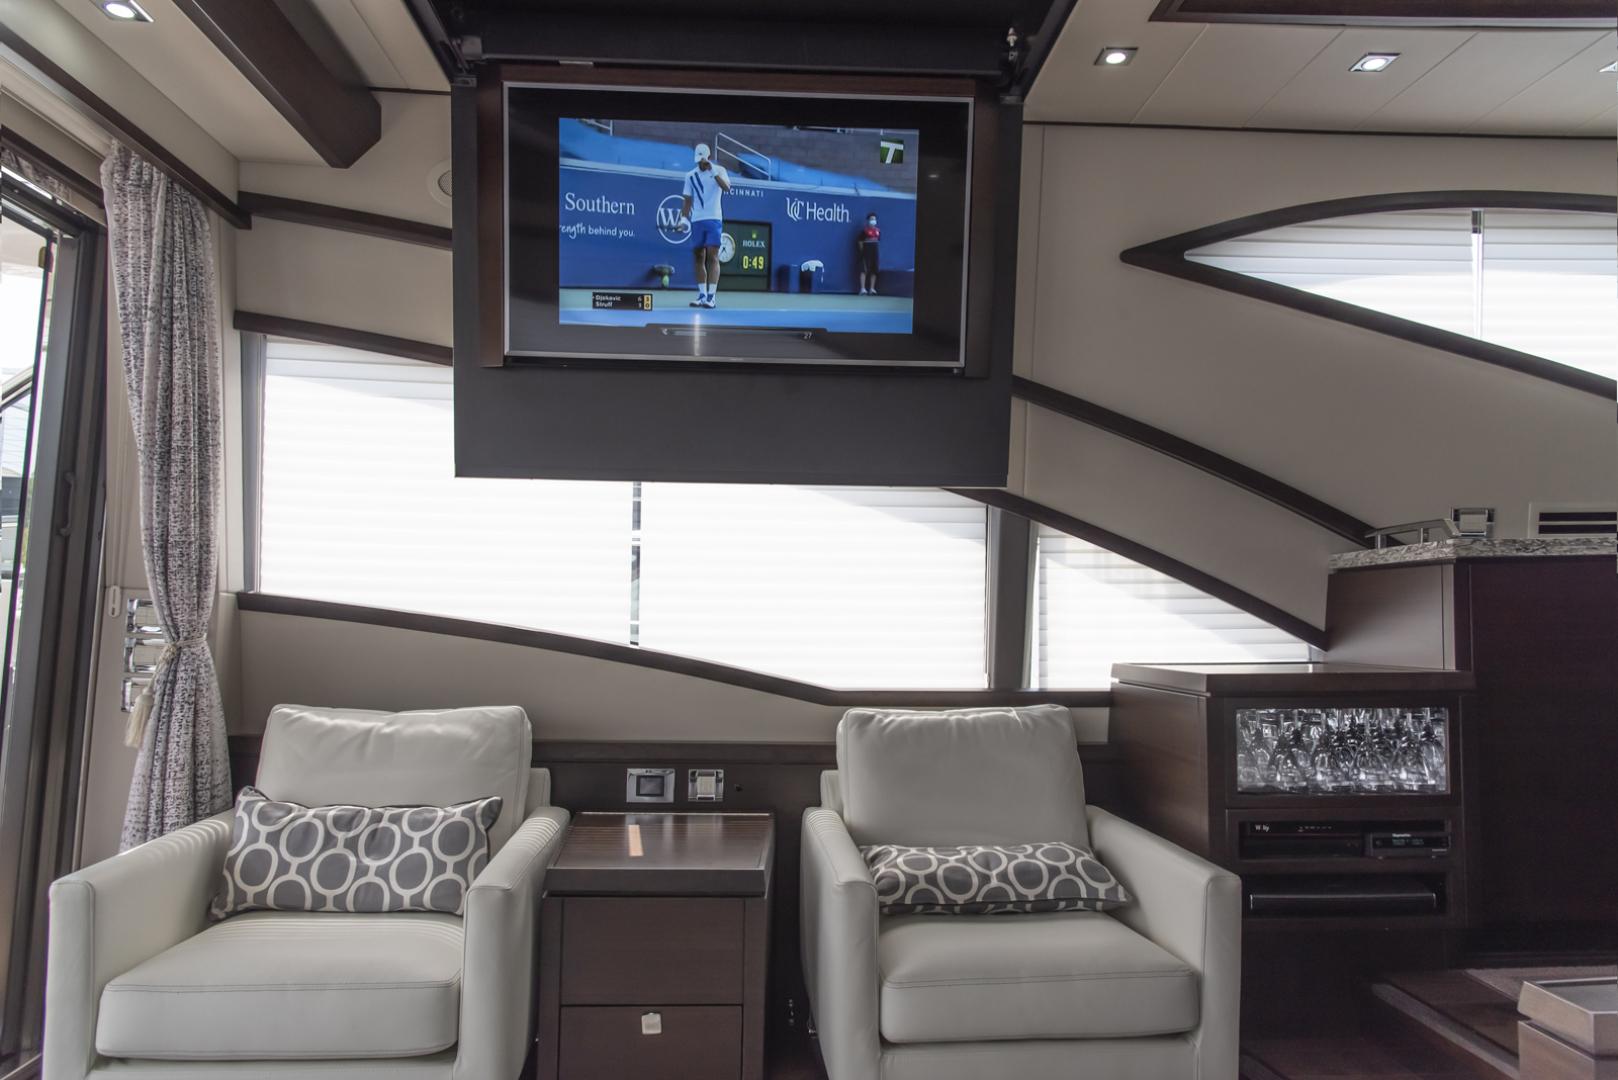 Neptunus-Motor Yacht Express 2018-LIQUID WISDOM Grand Haven-Michigan-United States-Salon TV-1484955 | Thumbnail